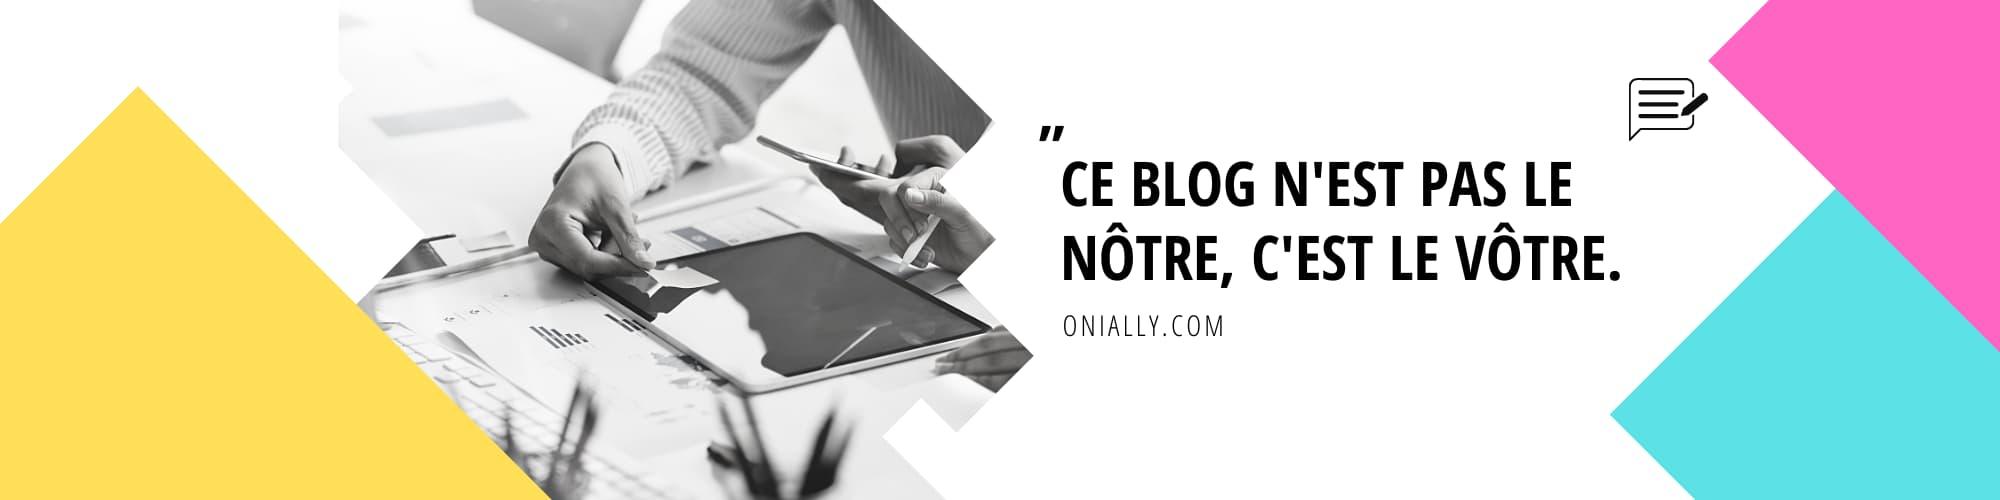 bannière blog onially